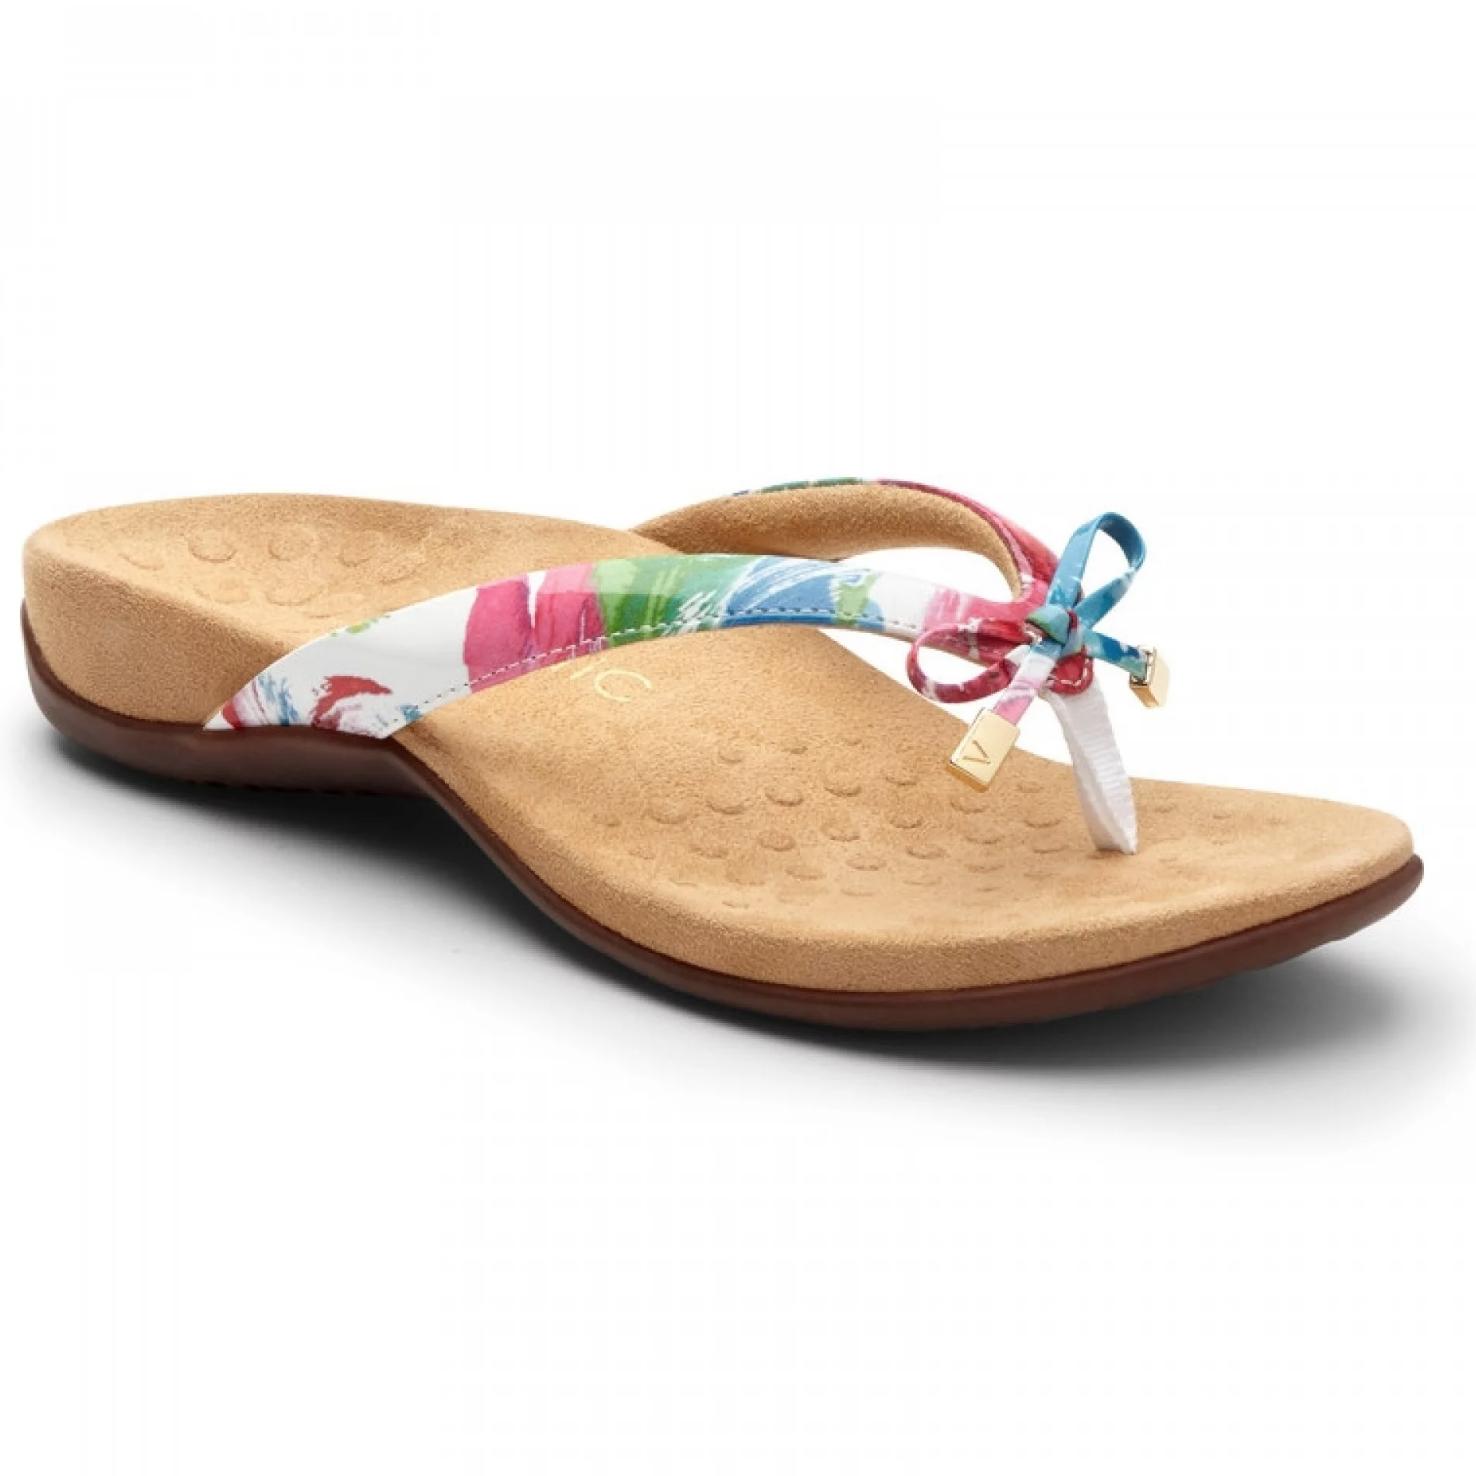 1e56934aeab Vionic Women s Bella II Toe-Post Sandal White Floral